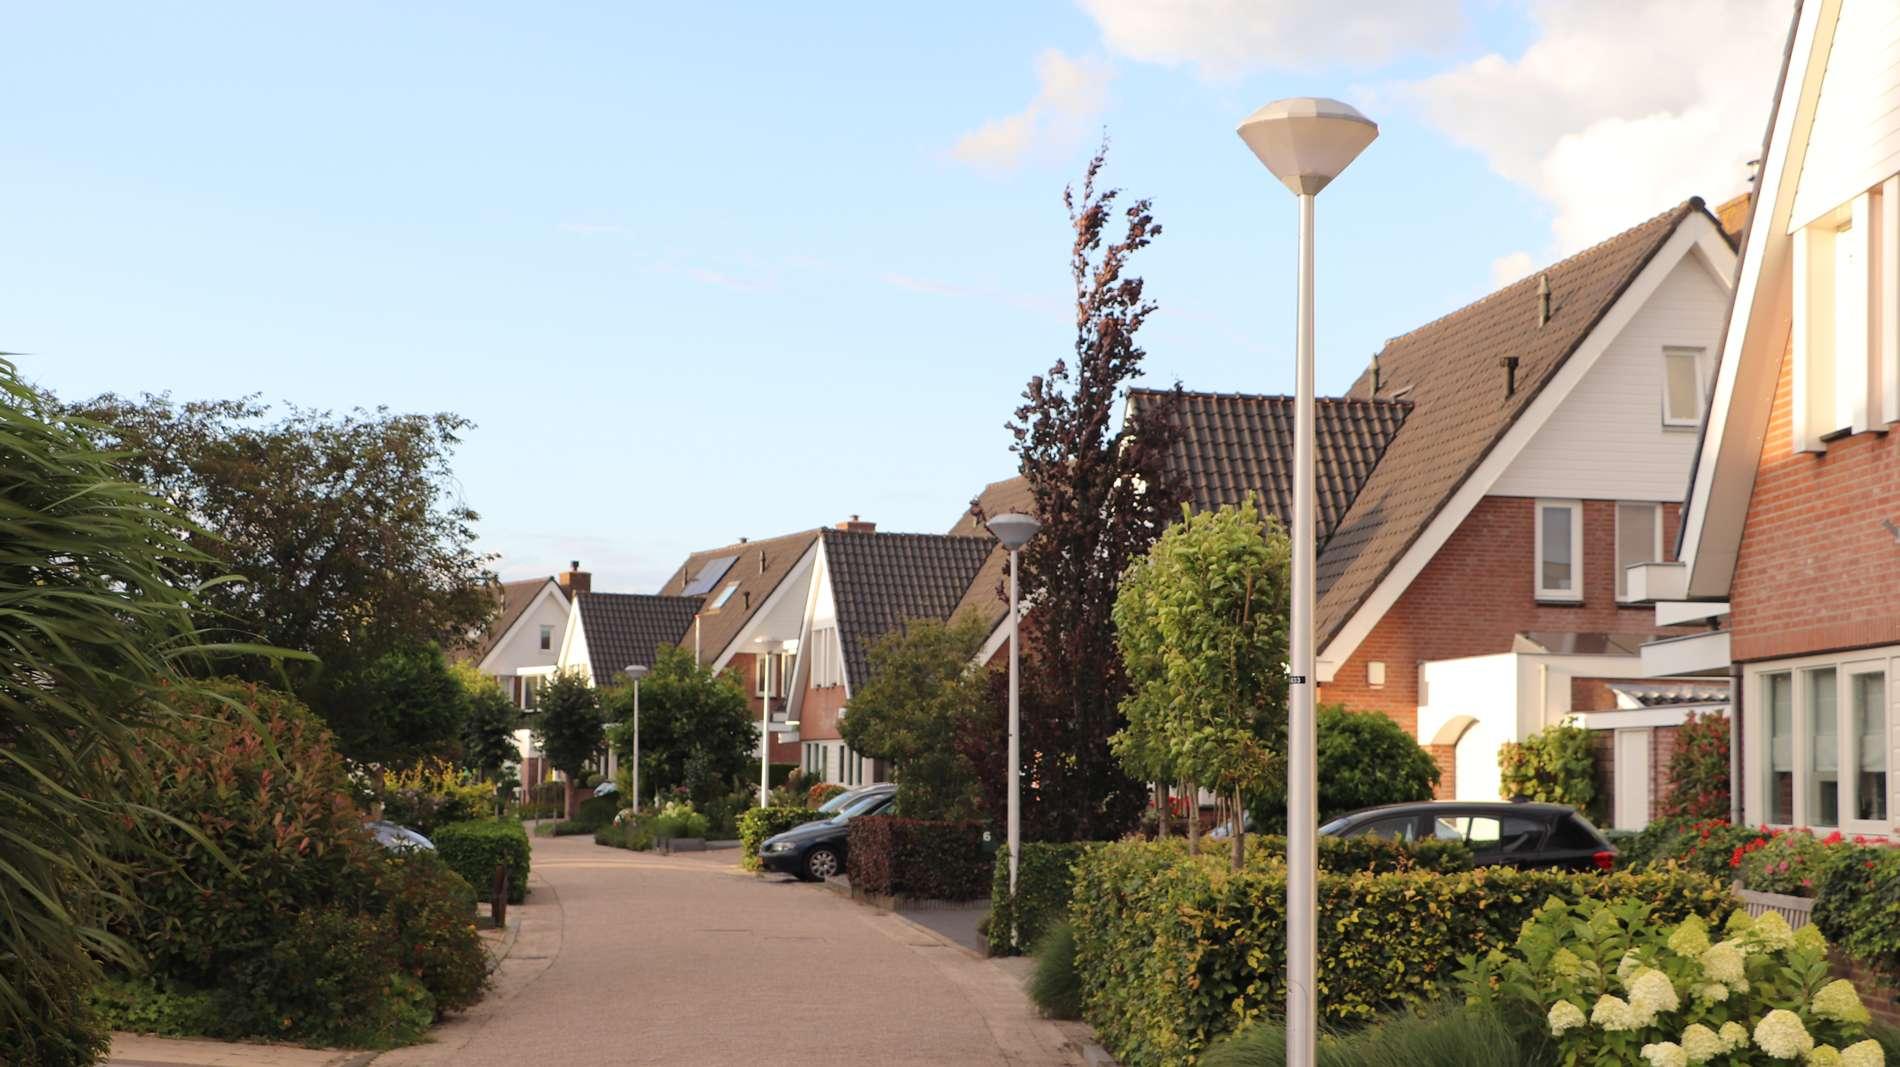 Project Bodegraven Reeuwijk